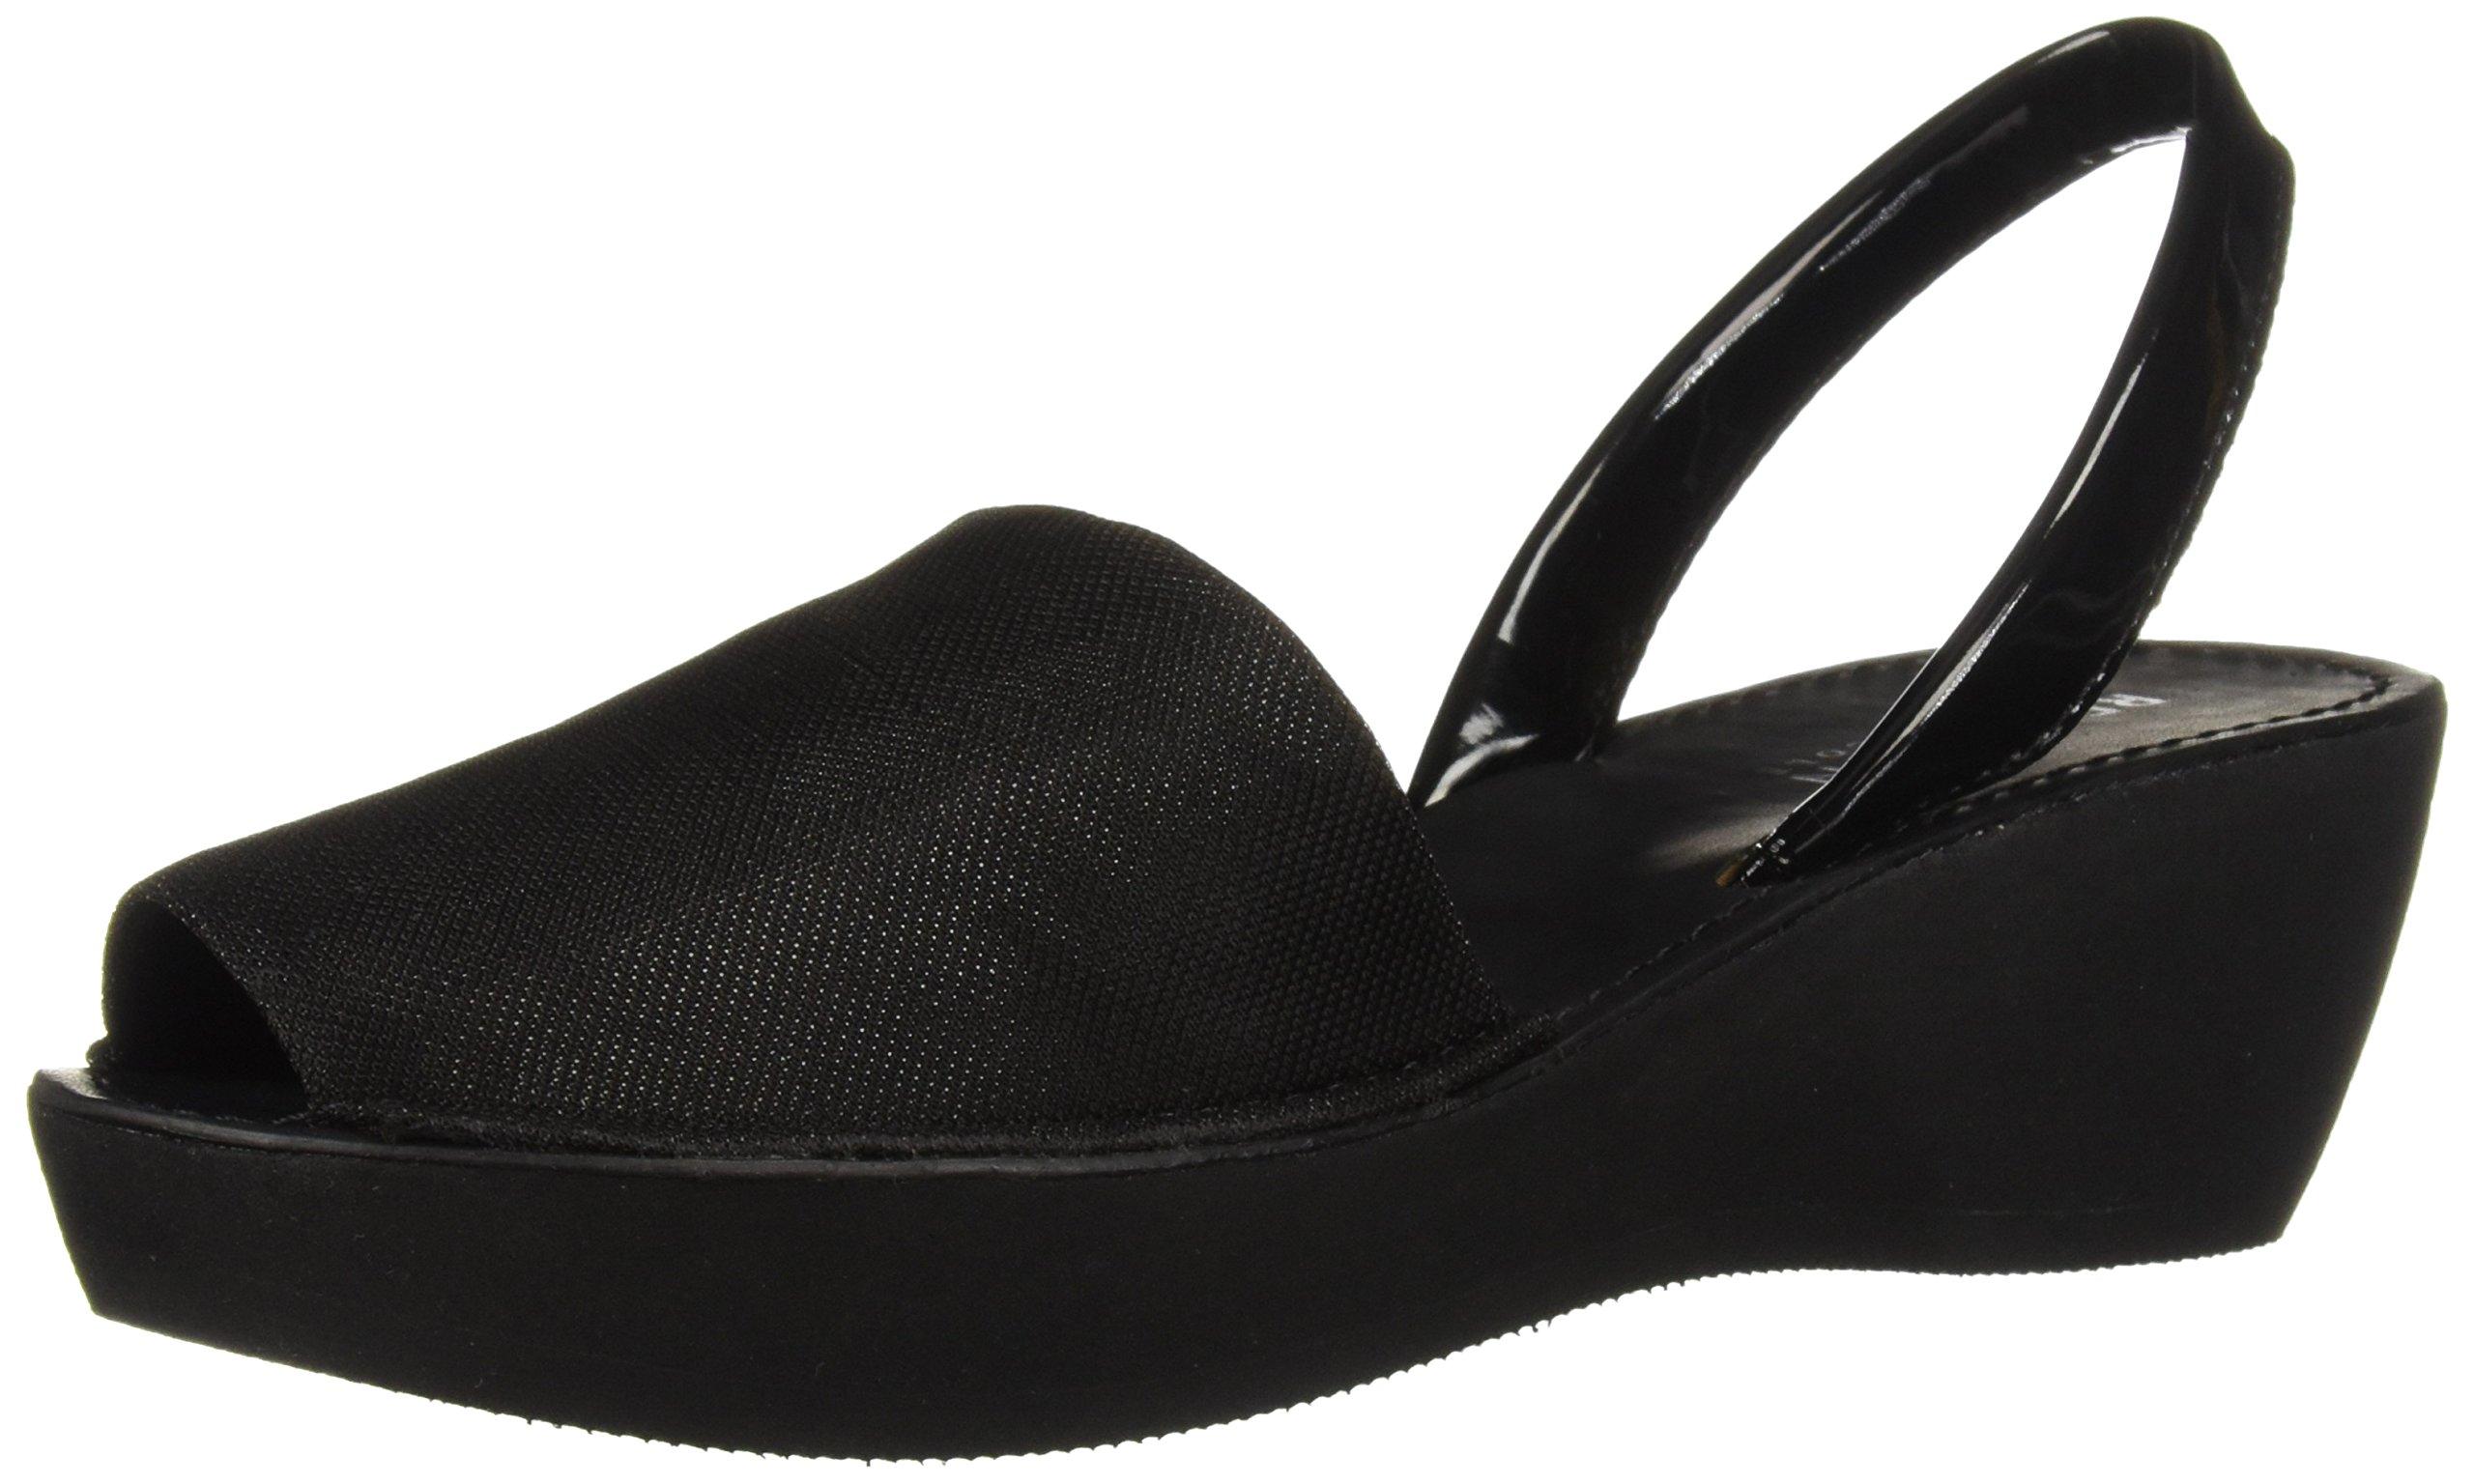 Kenneth Cole REACTION Women's Fine Glass Backstrap Wedge Sandal, Black Stretch Metallic, 9.5 M US